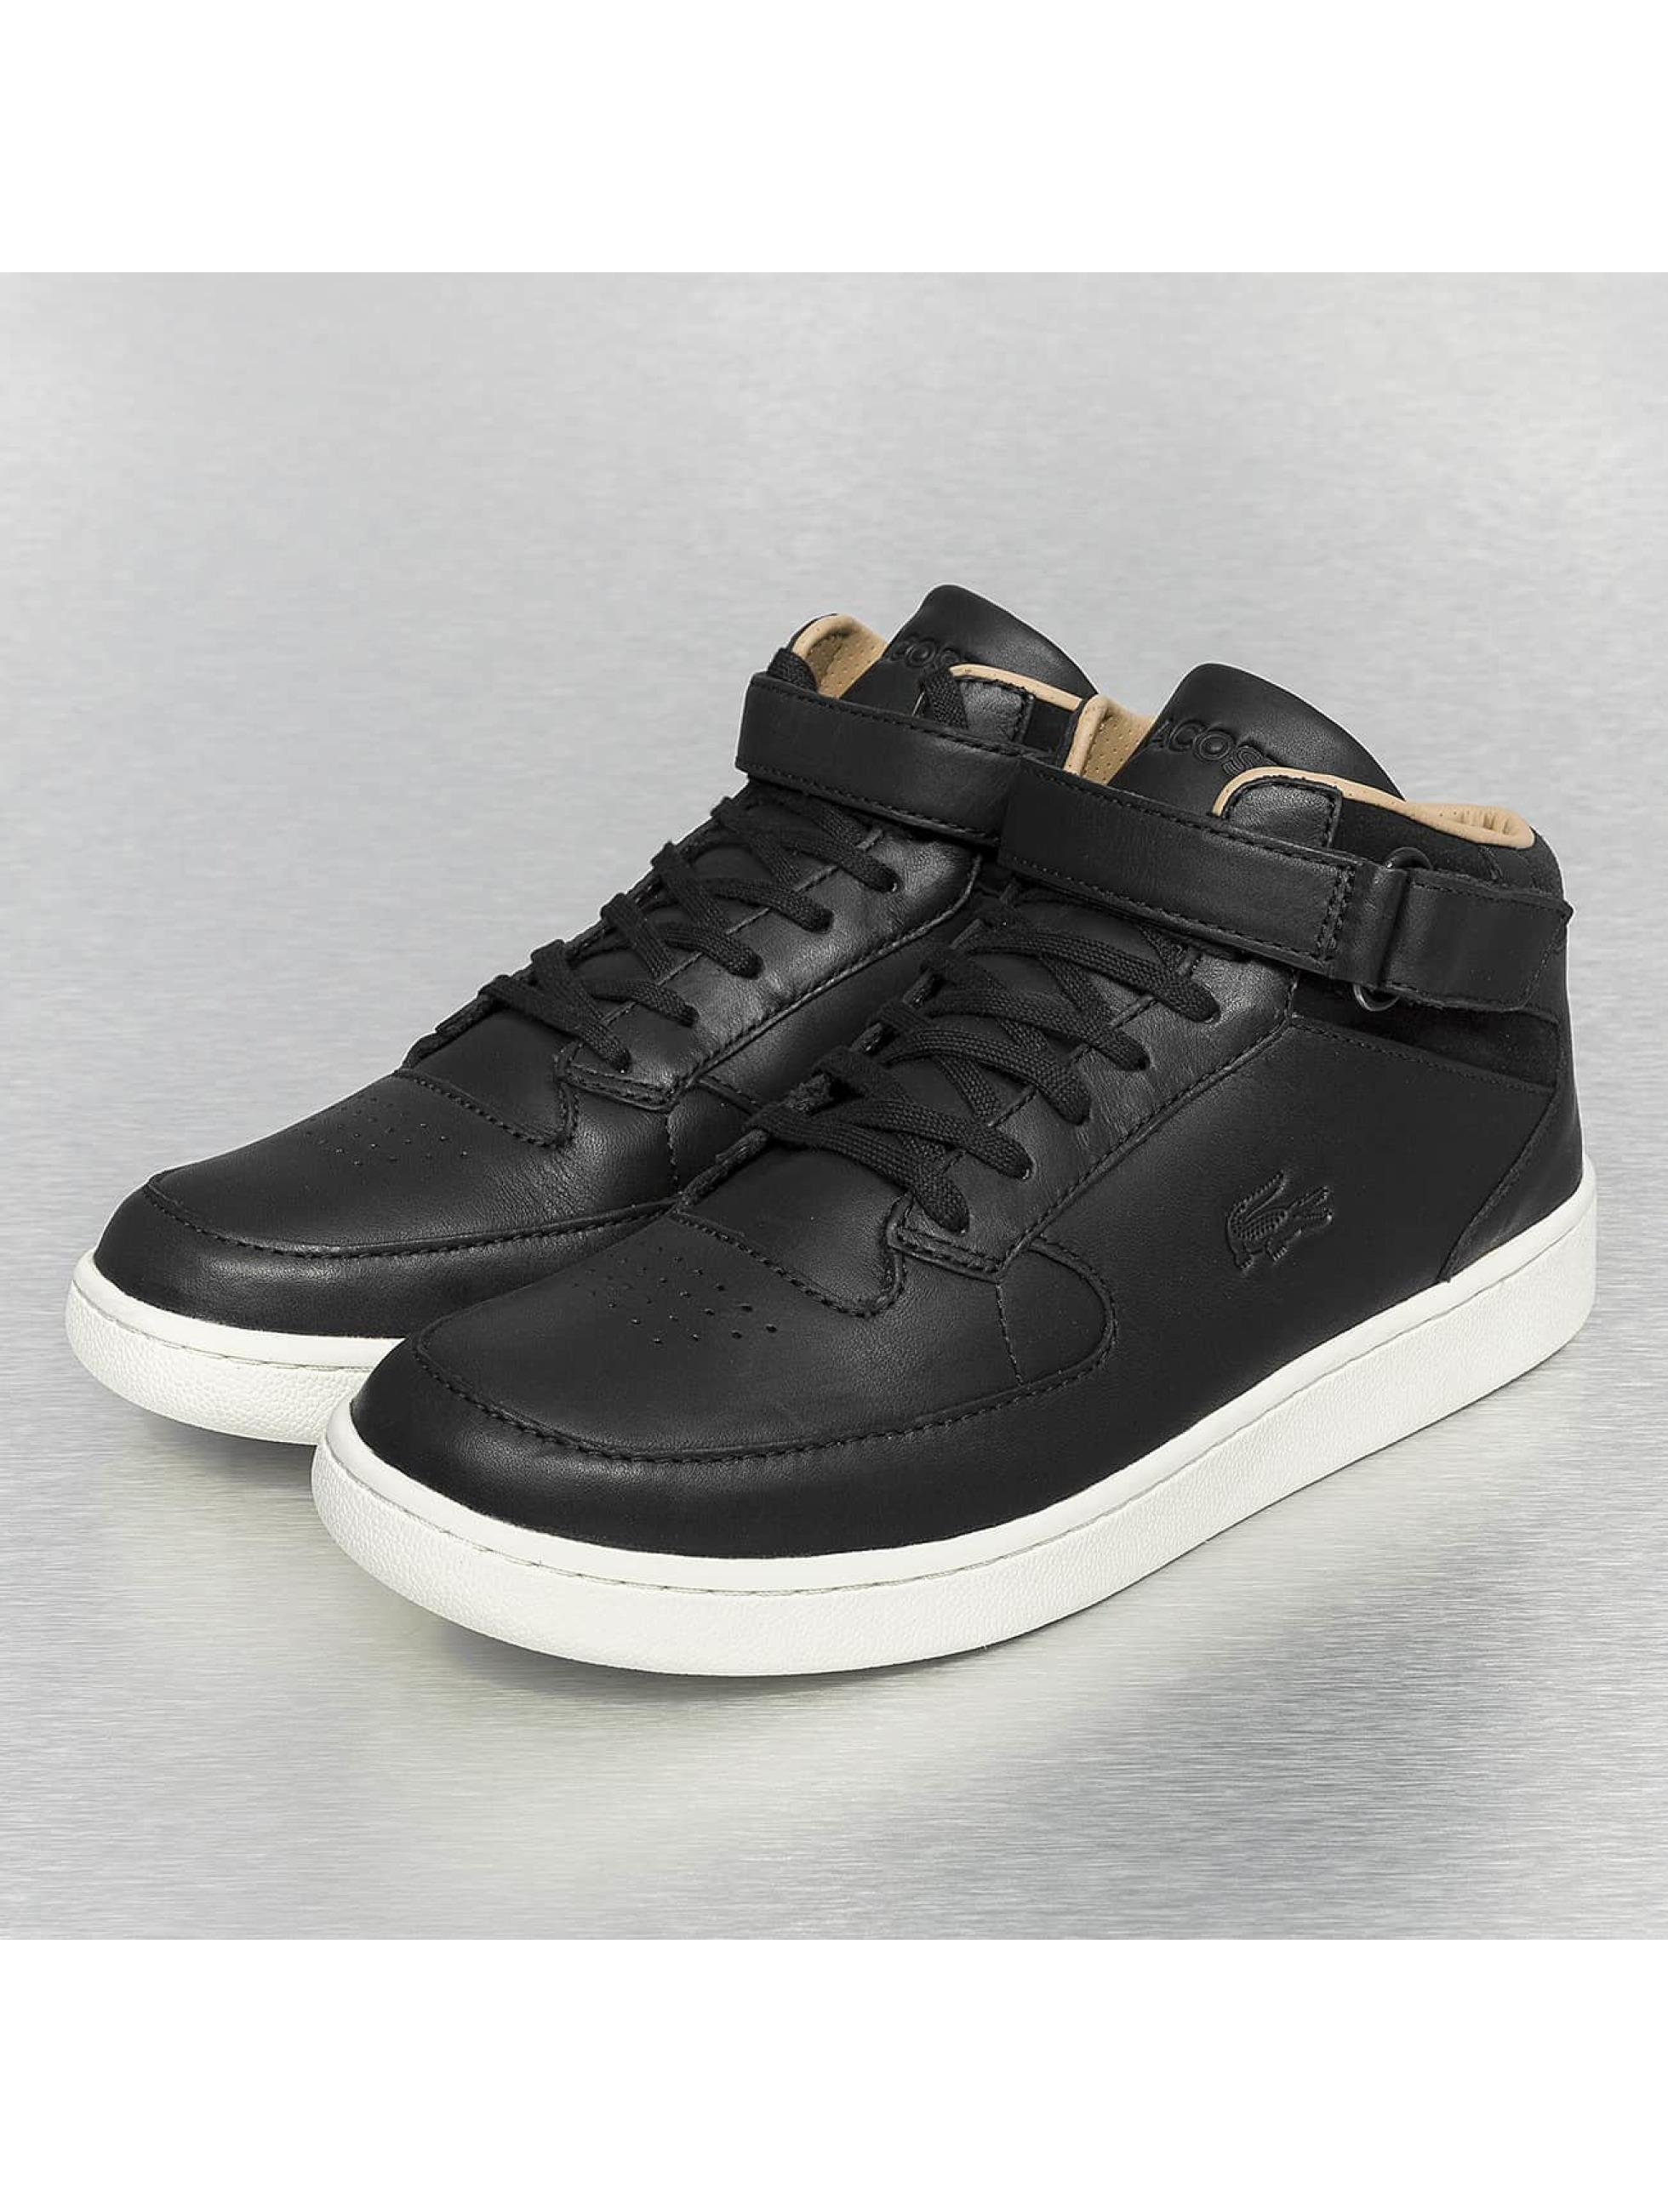 lacoste chaussures baskets turbo srm en noir 208246. Black Bedroom Furniture Sets. Home Design Ideas